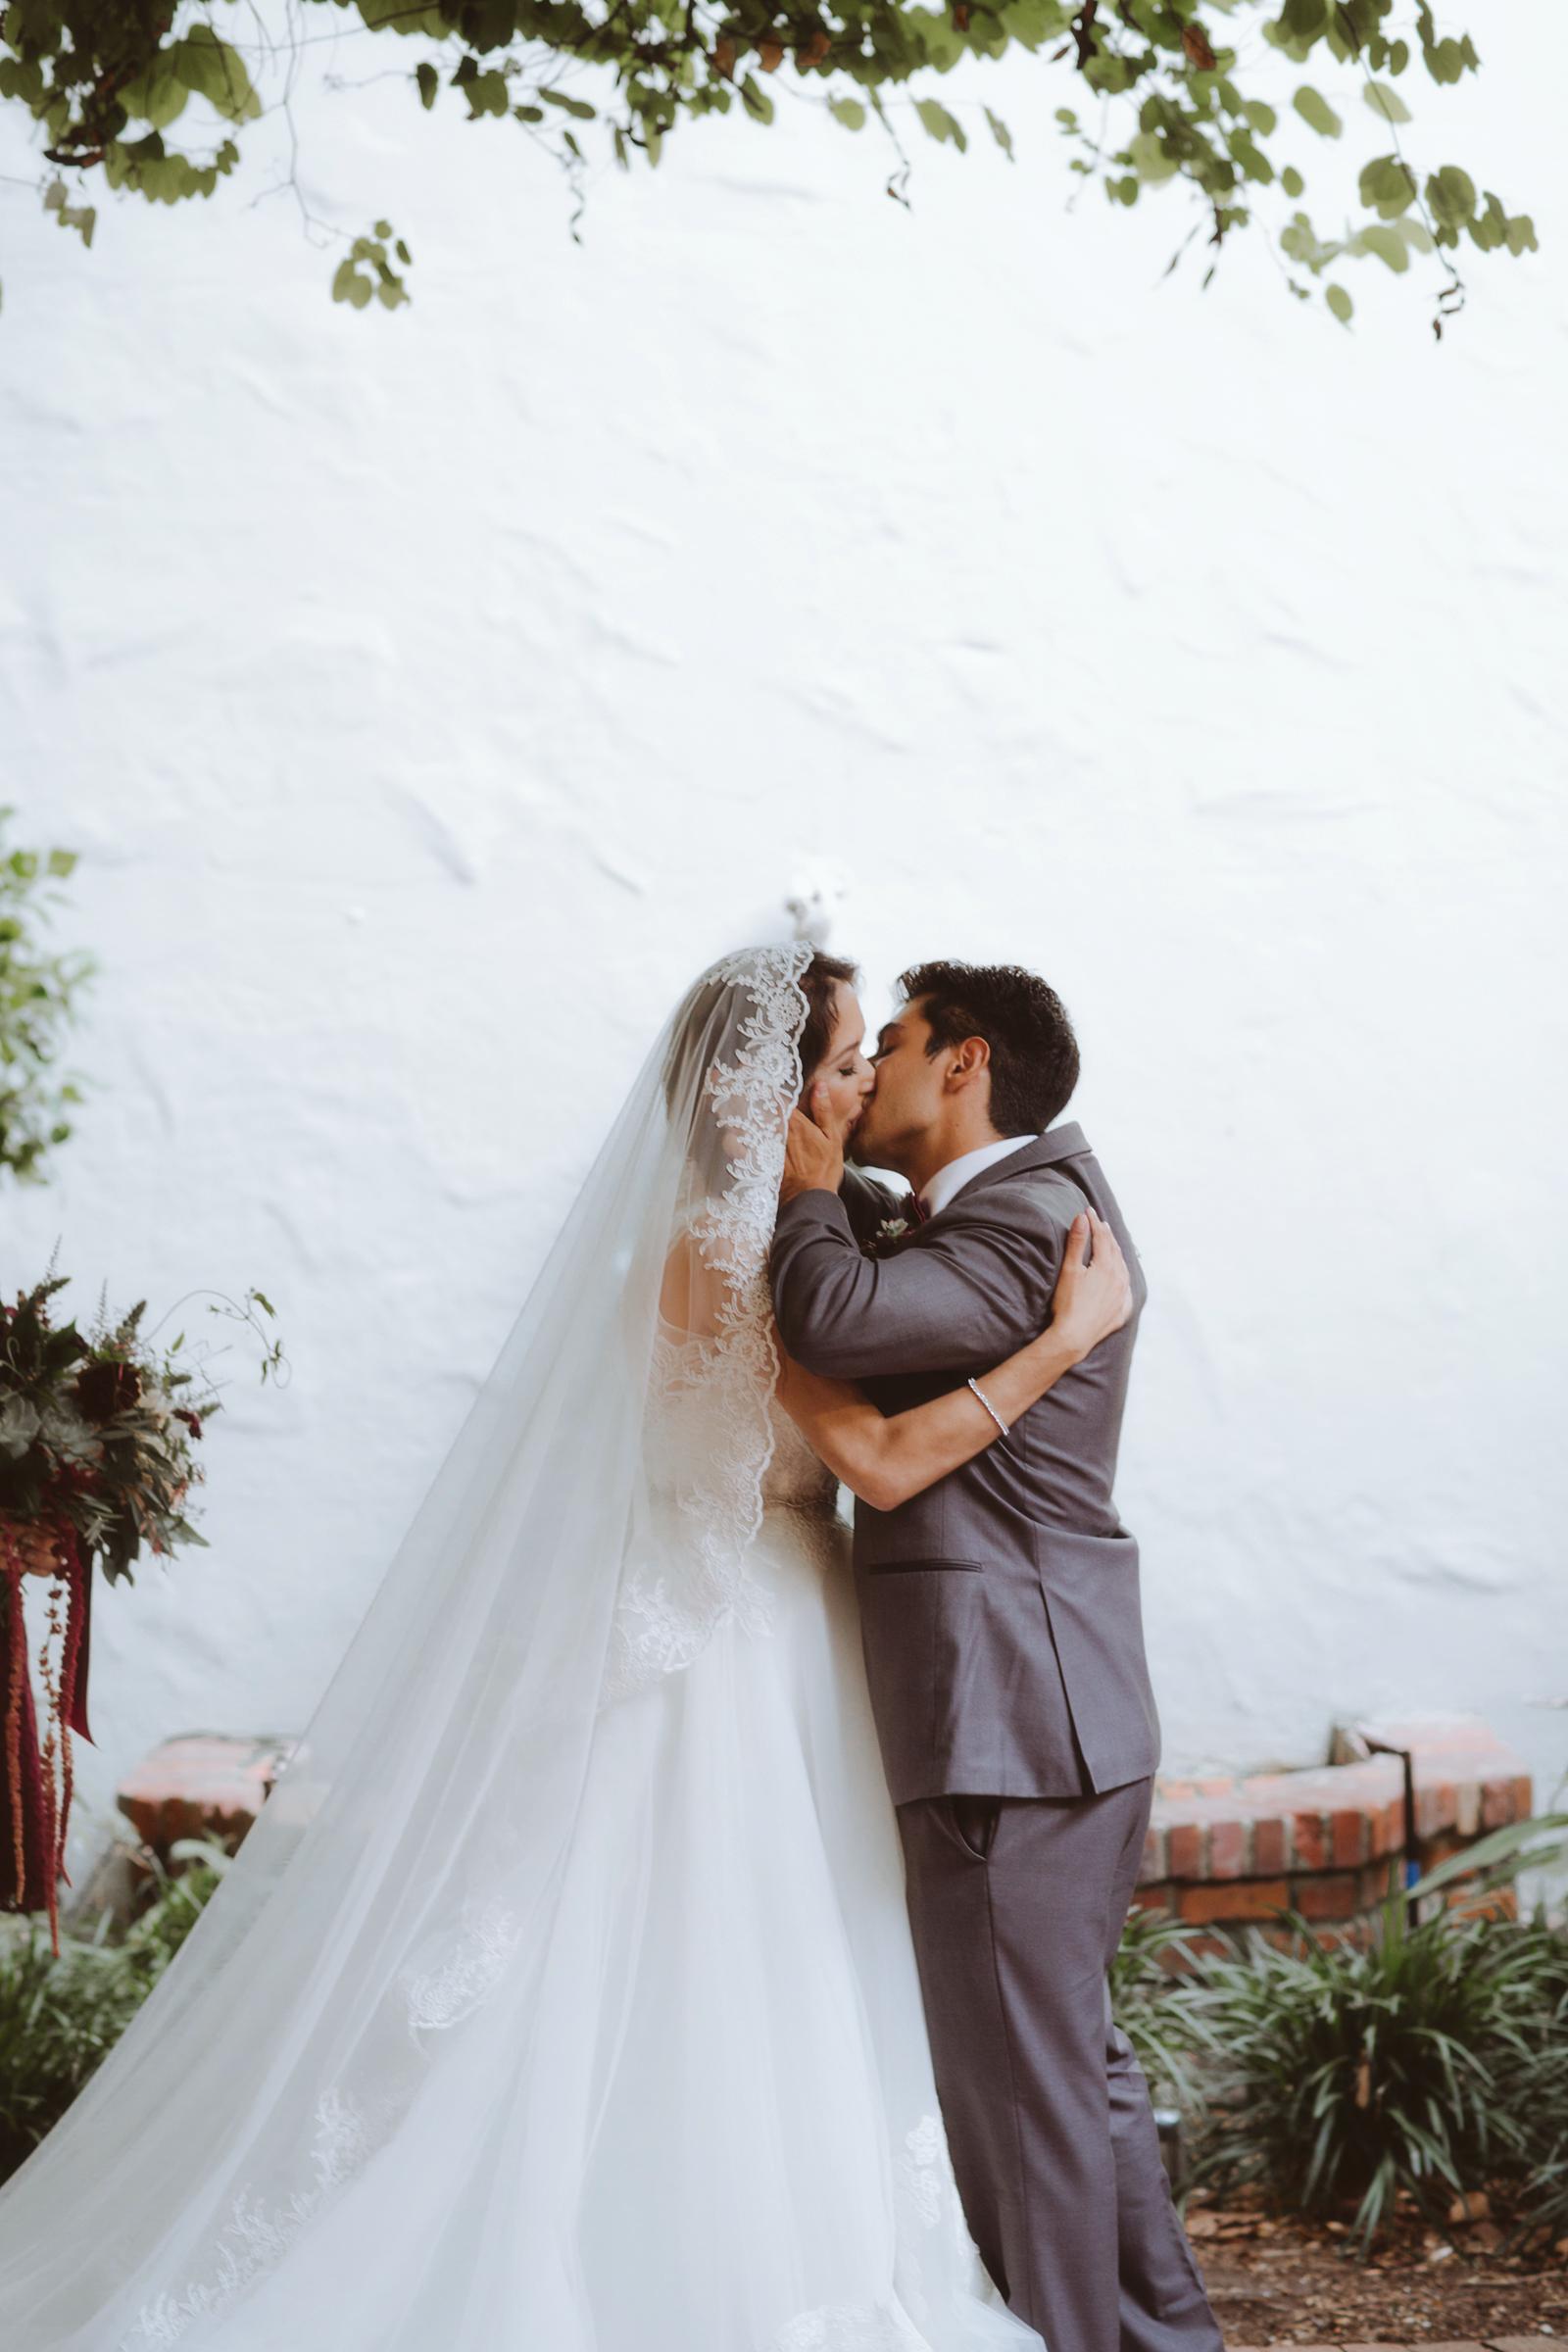 wedding day | MFA St Pete | Vanessa Boy Photography | vanessaboy.com-375.com |final.jpg